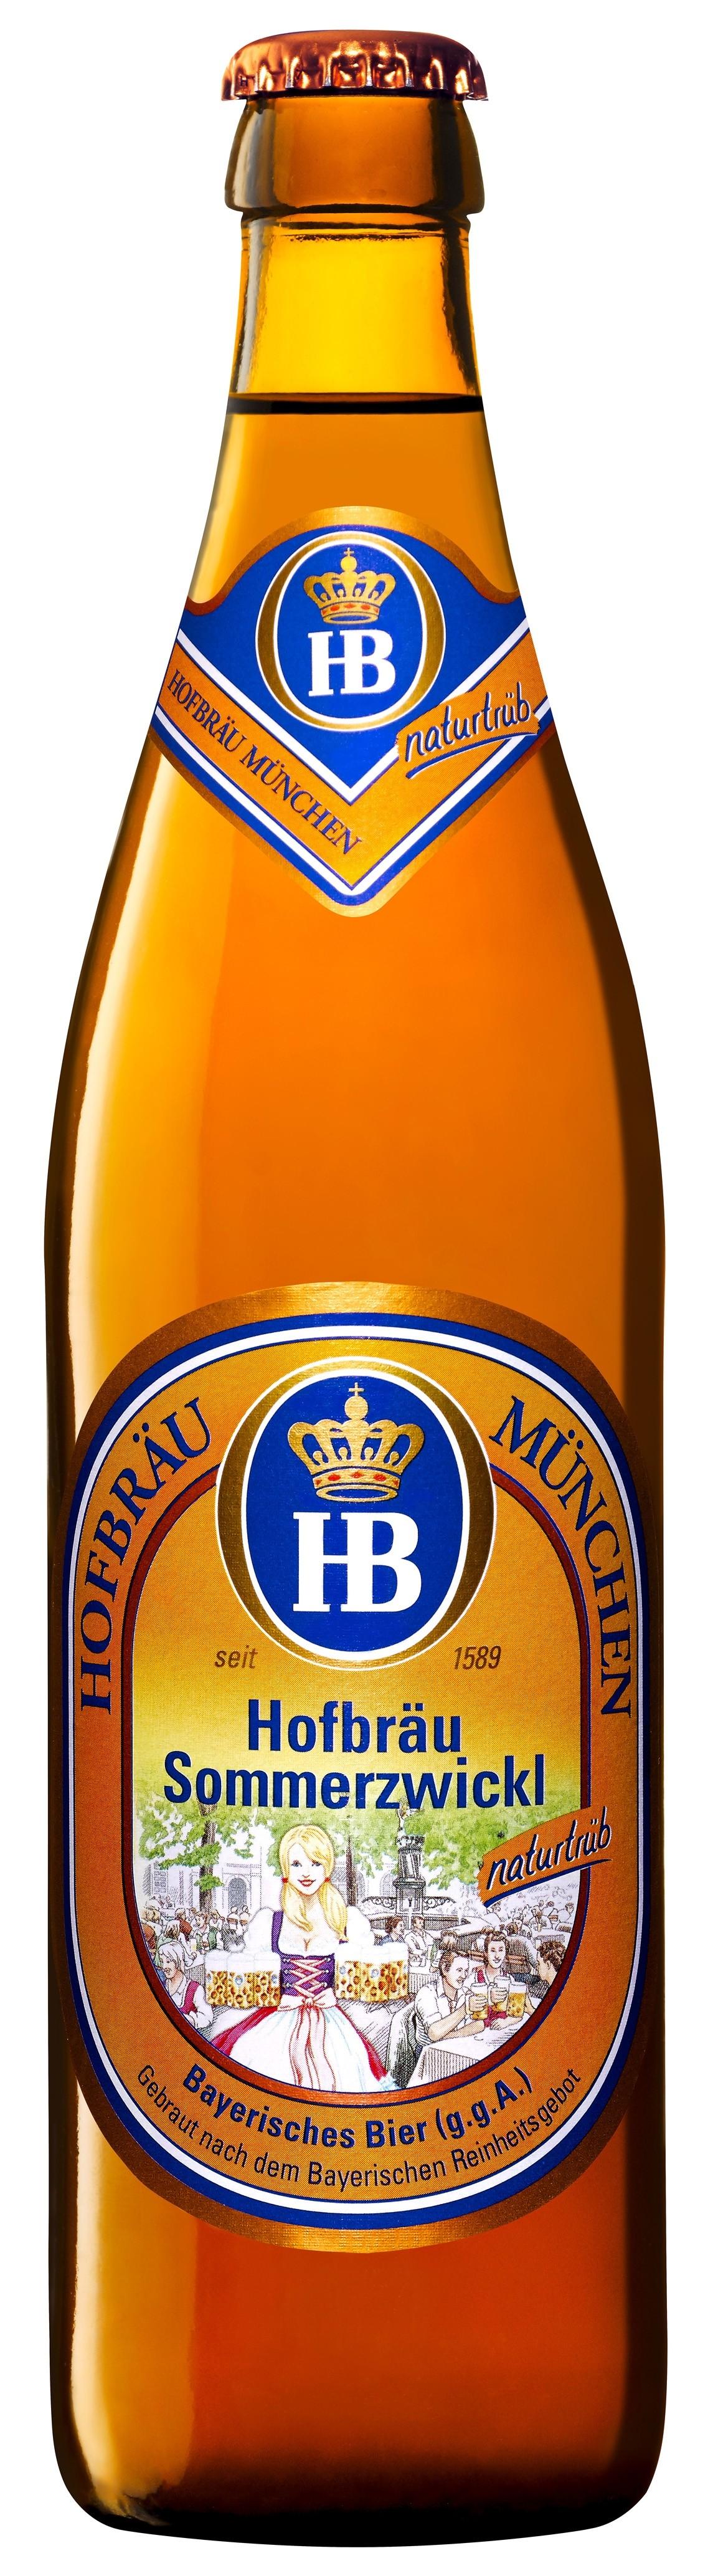 Hofbräu München - Hofbräu Sommerzwickl